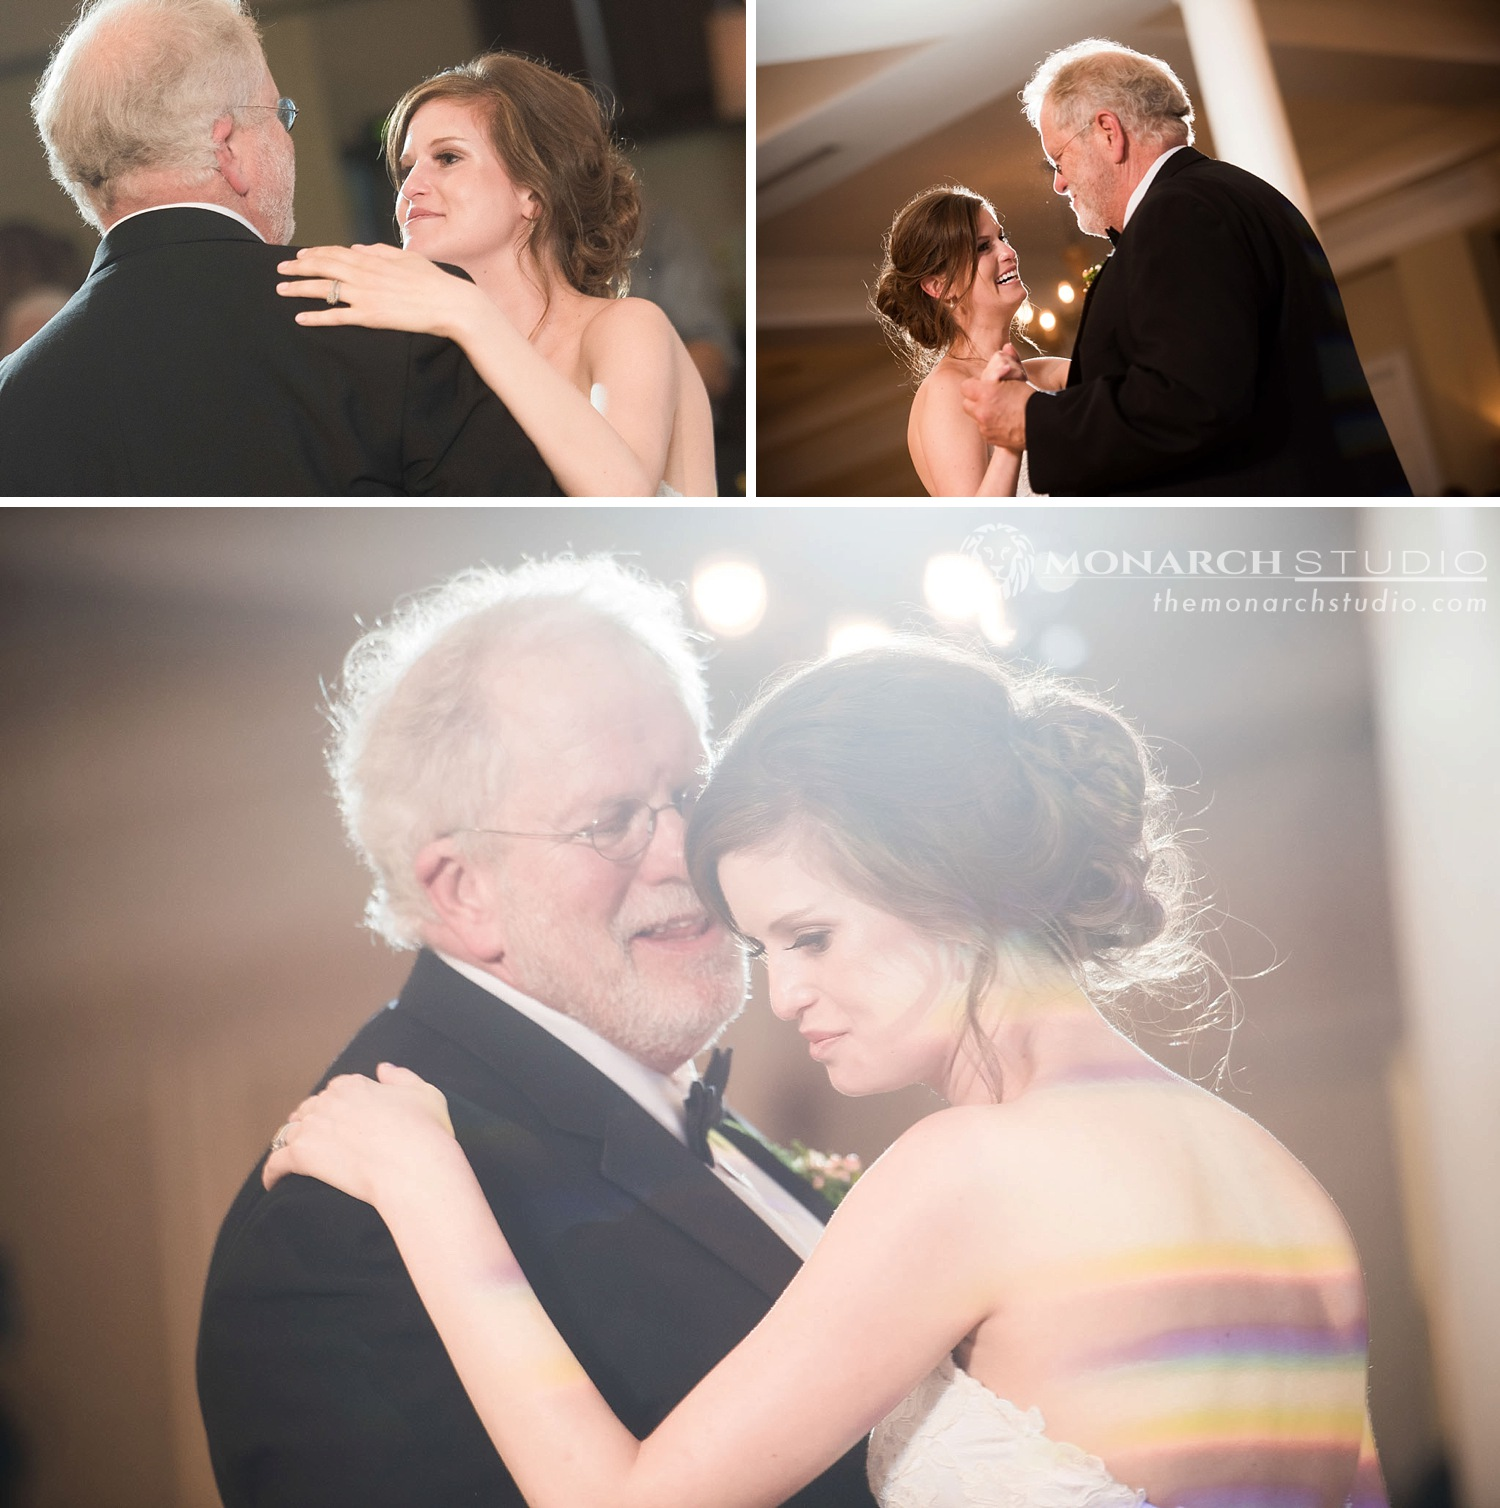 St-Augustine-Wedding-Photographer-Zach-Thomas-Riverhouse-Monarch-109.JPG